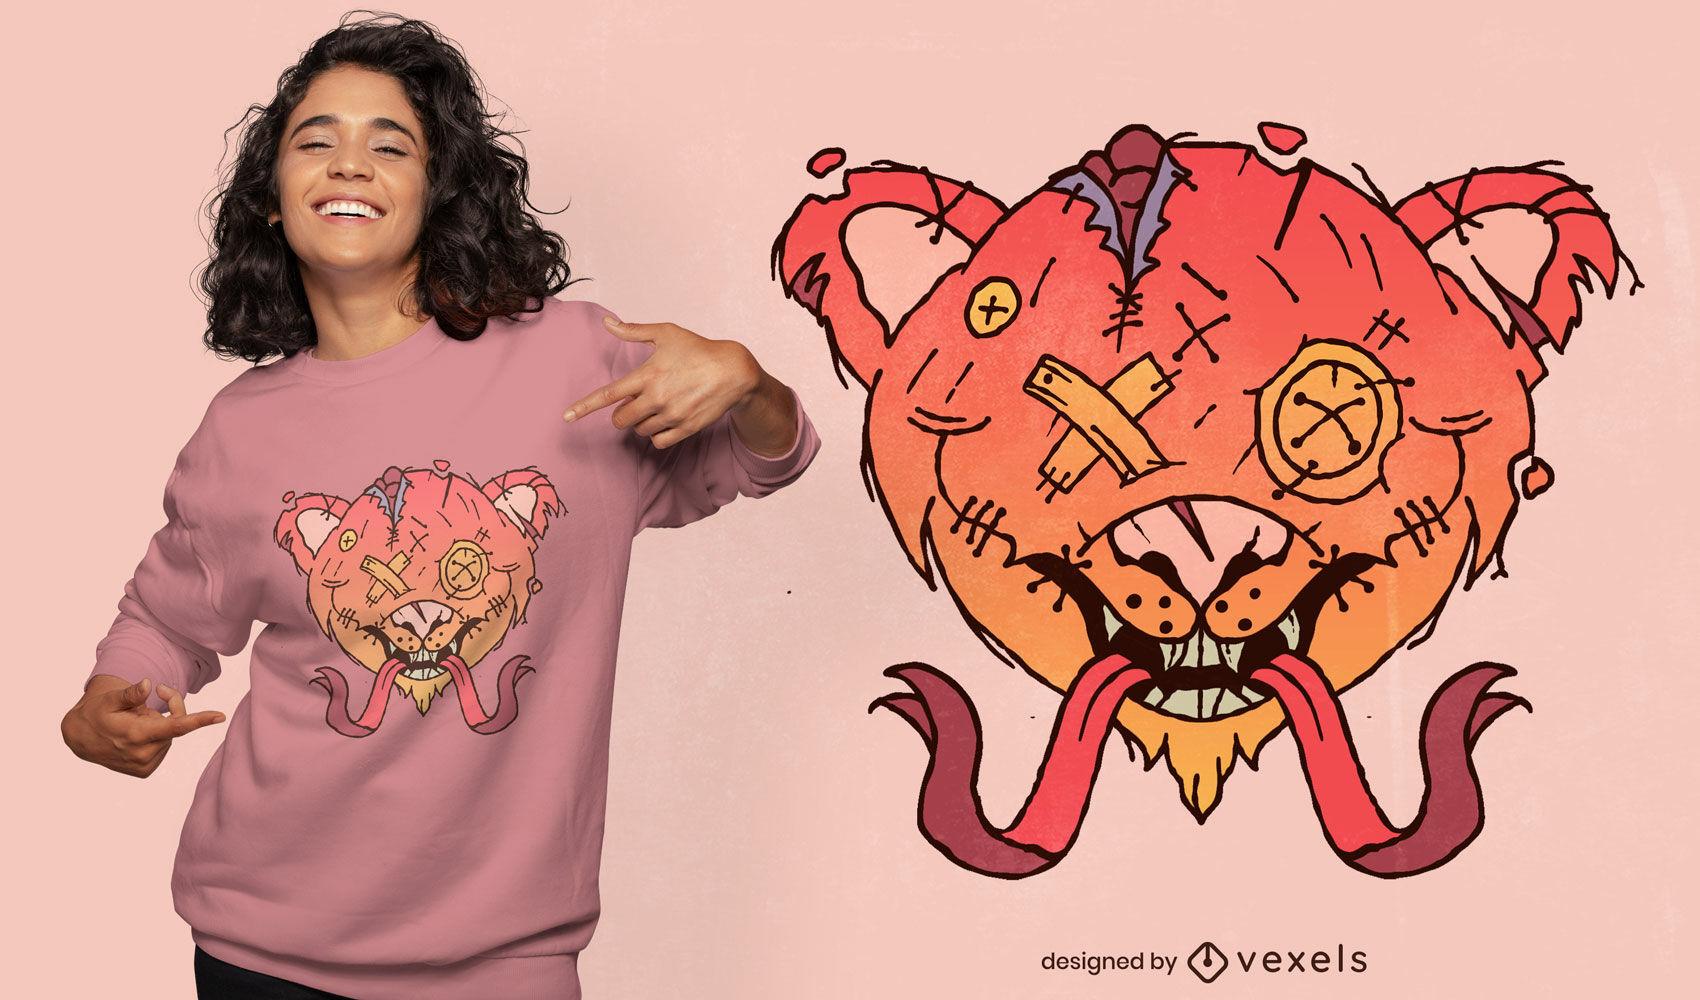 Halloween creepy teddy bear t-shirt design